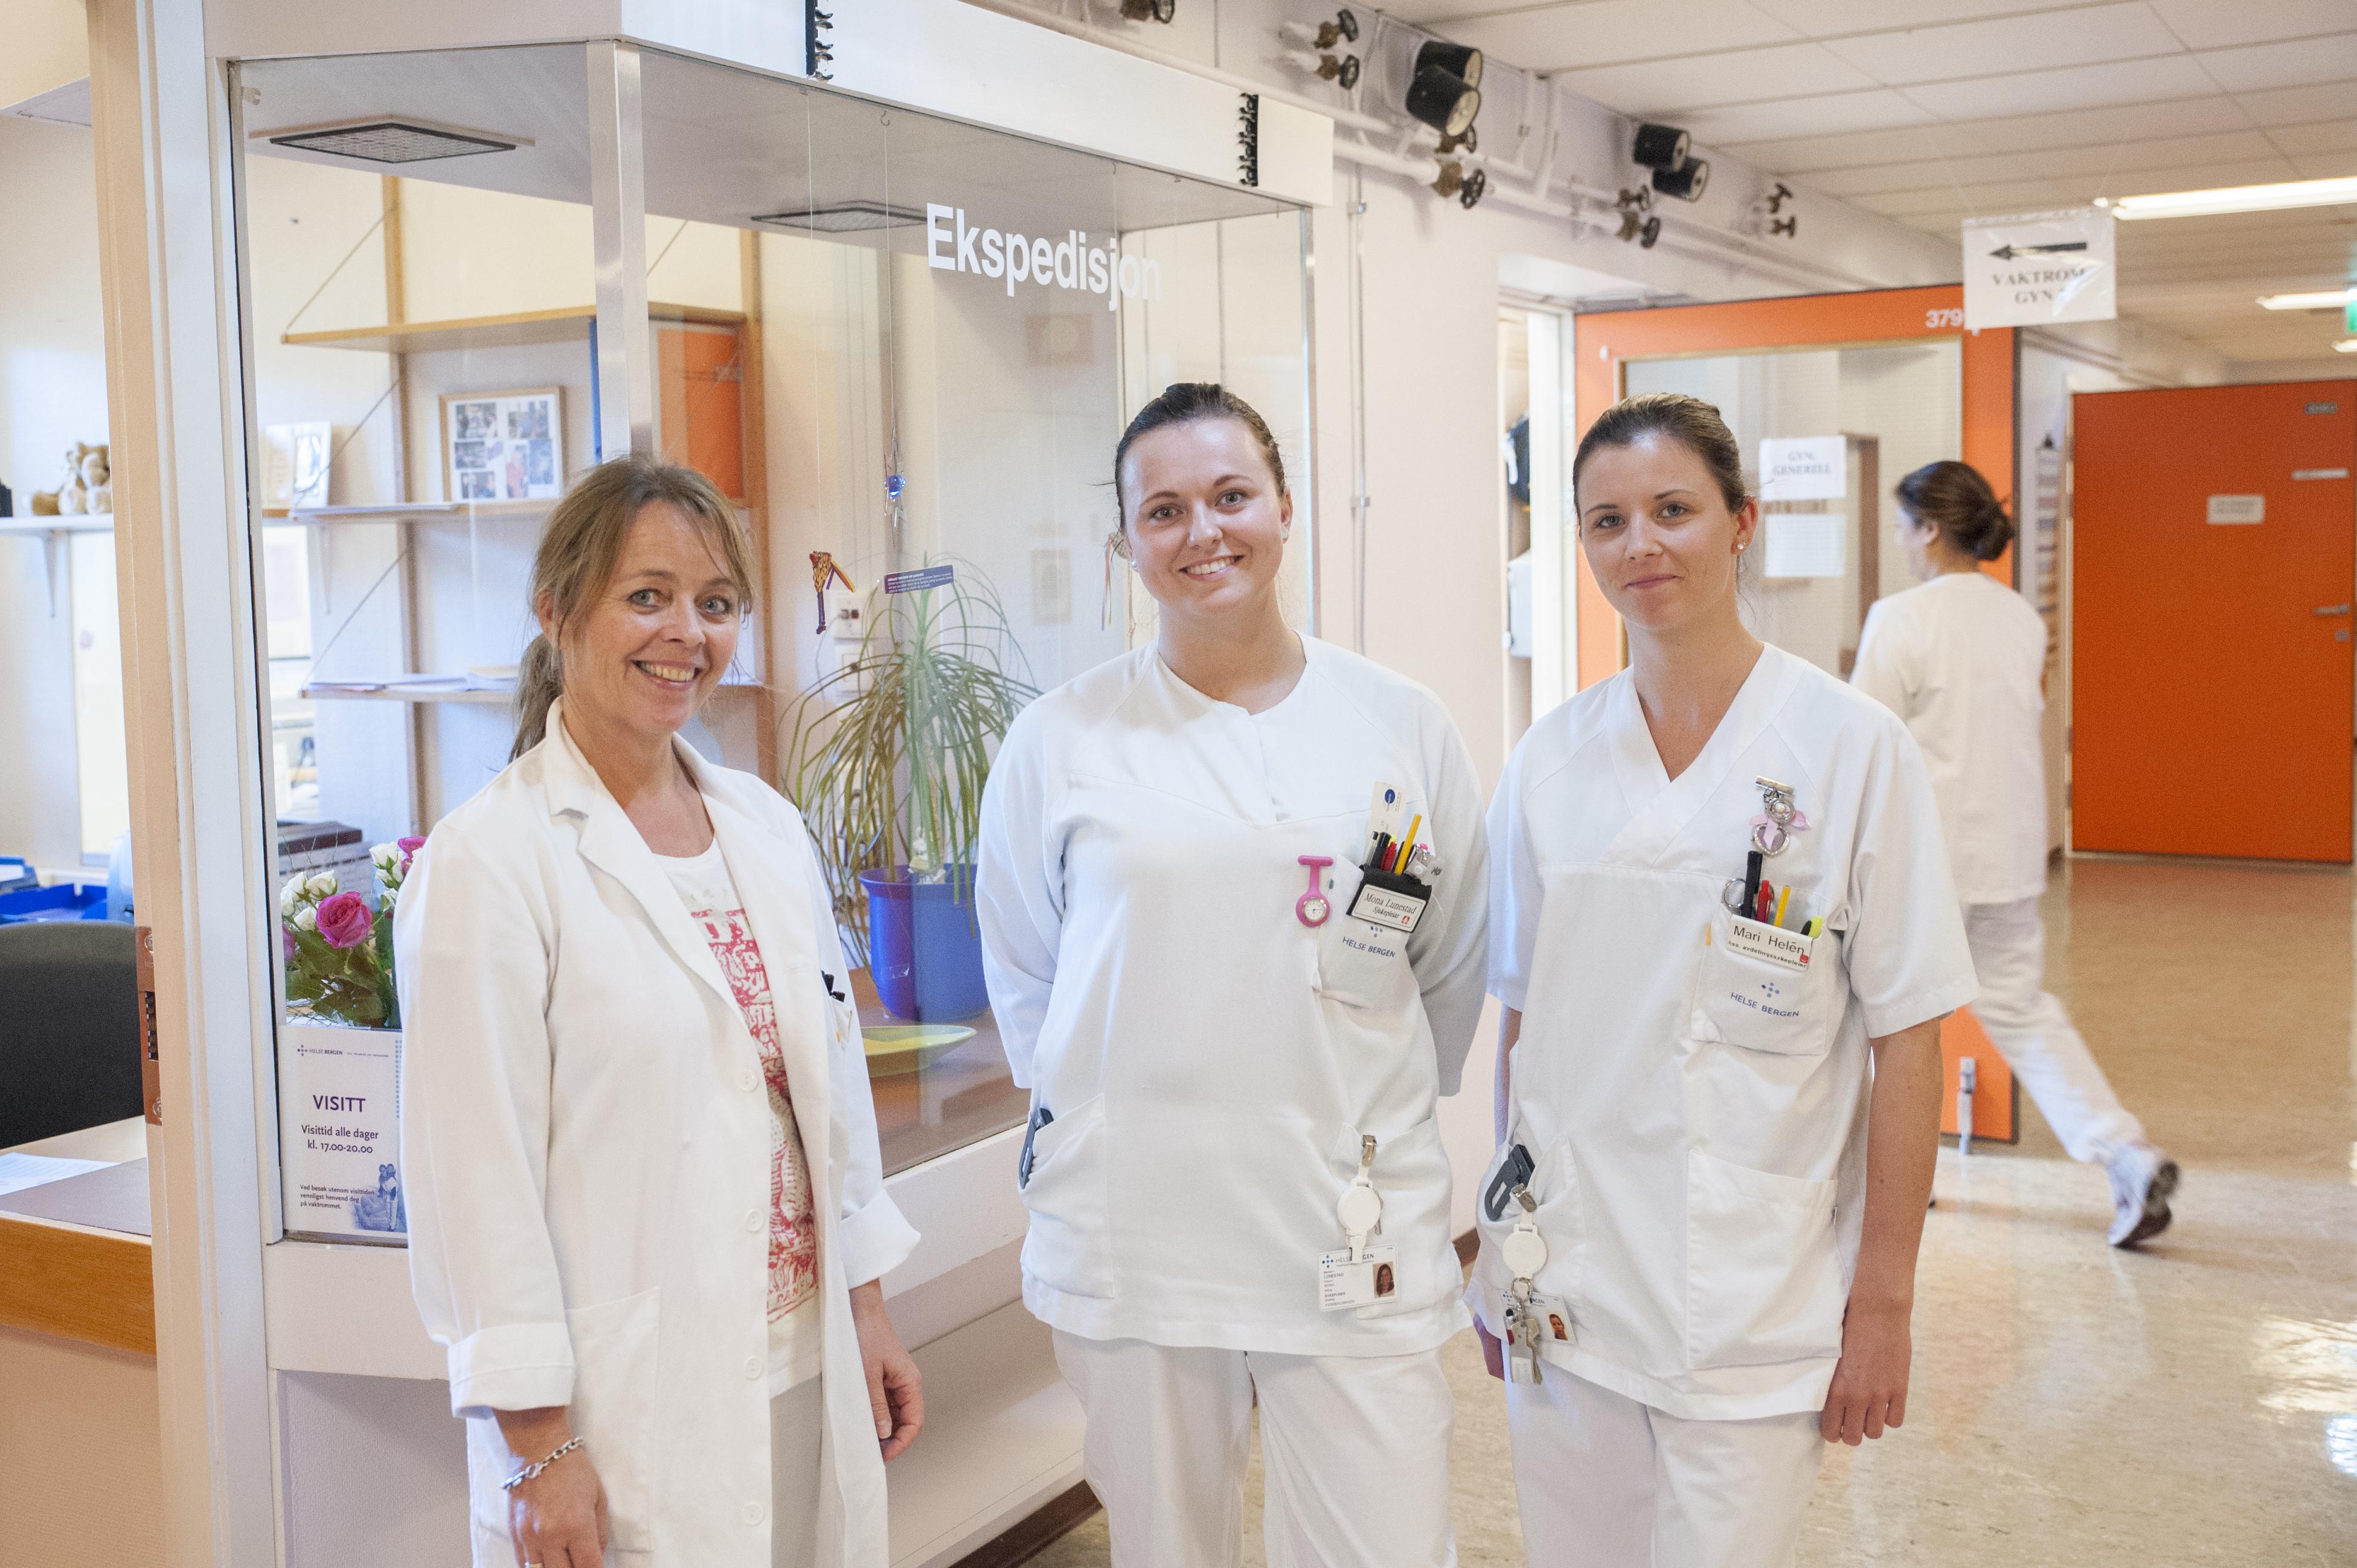 gynekologisk avdeling